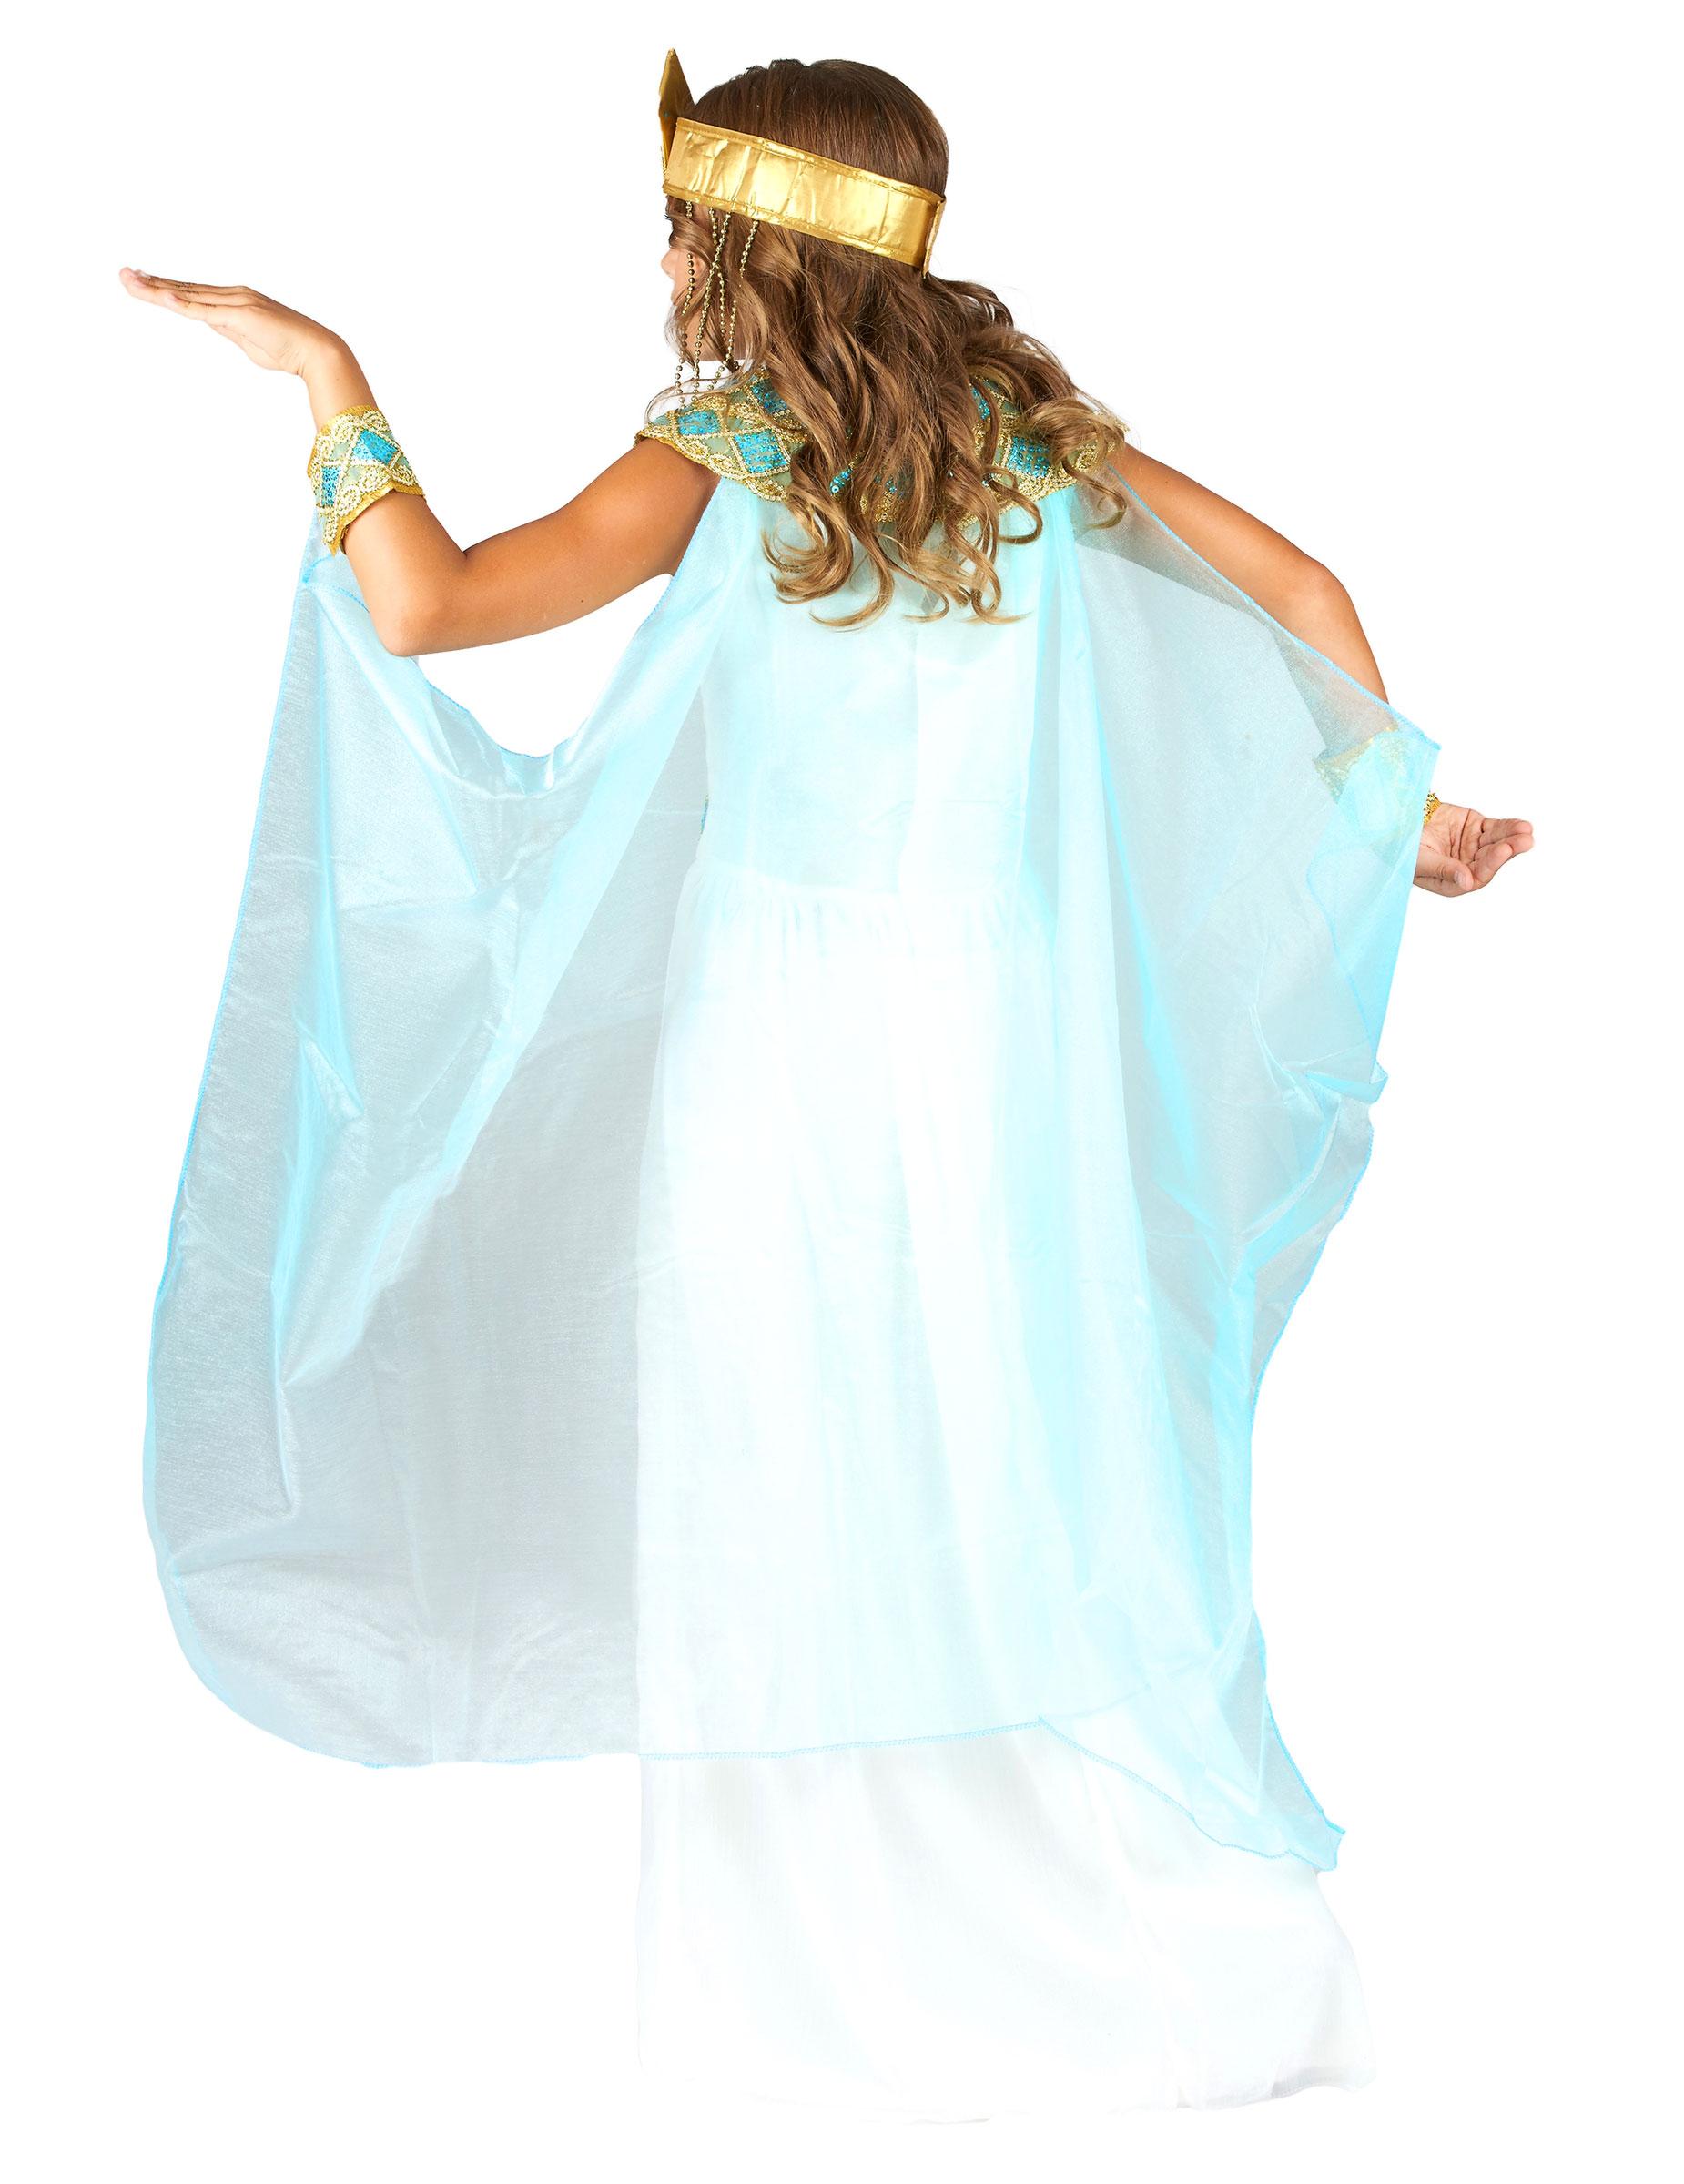 Kleopatrakostum Fur Kinder Kostume Fur Kinder Und Gunstige